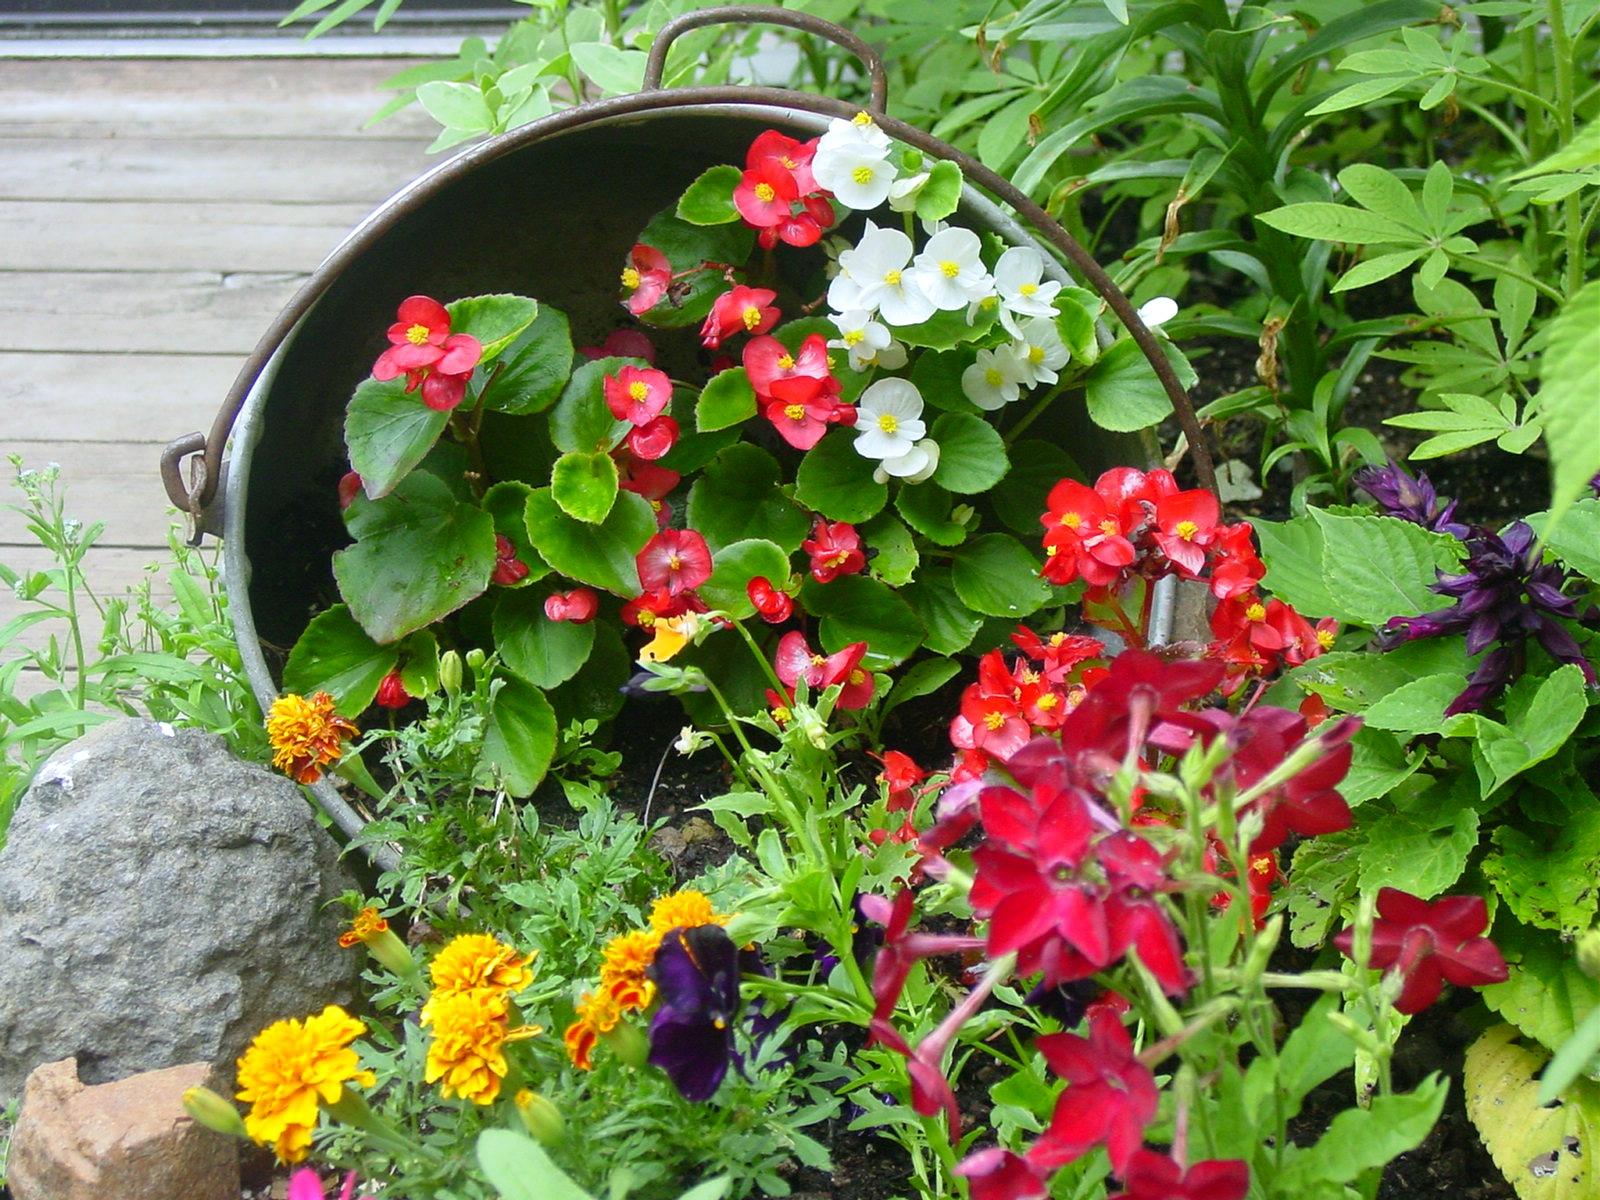 Wildflower clipart flower bucket Flowers Perfect Bucket Of Of